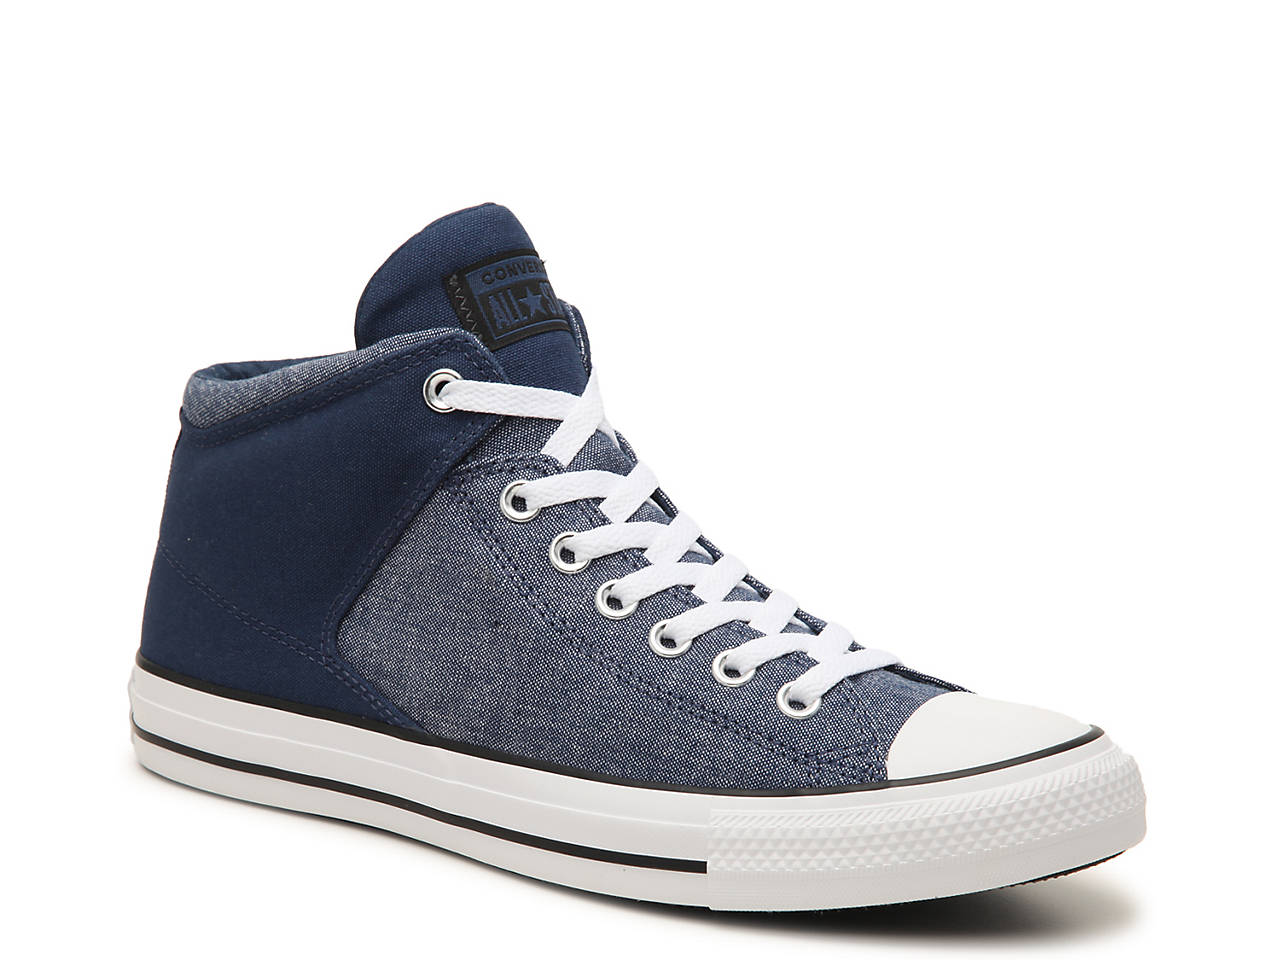 2eadb809f5 Chuck Taylor All Star Hi Street High-Top Sneaker - Men's